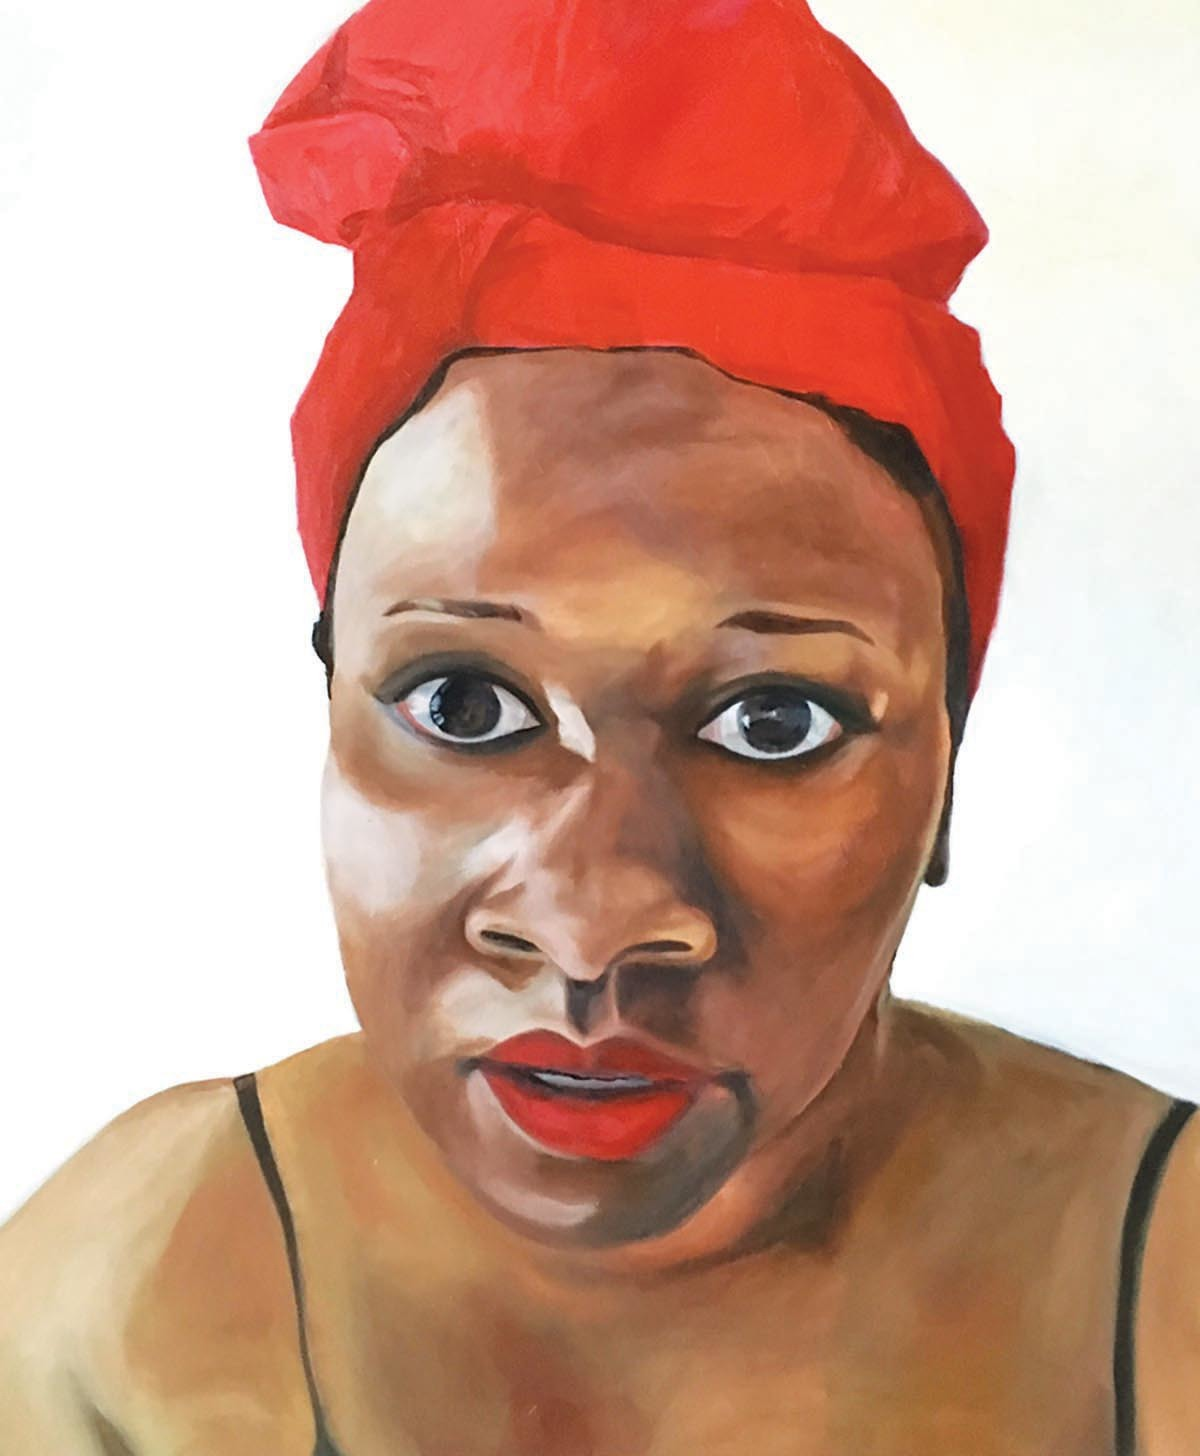 "Donna Woodley, Kelsheika, 2016, oil on canvas, 30 x 36"""